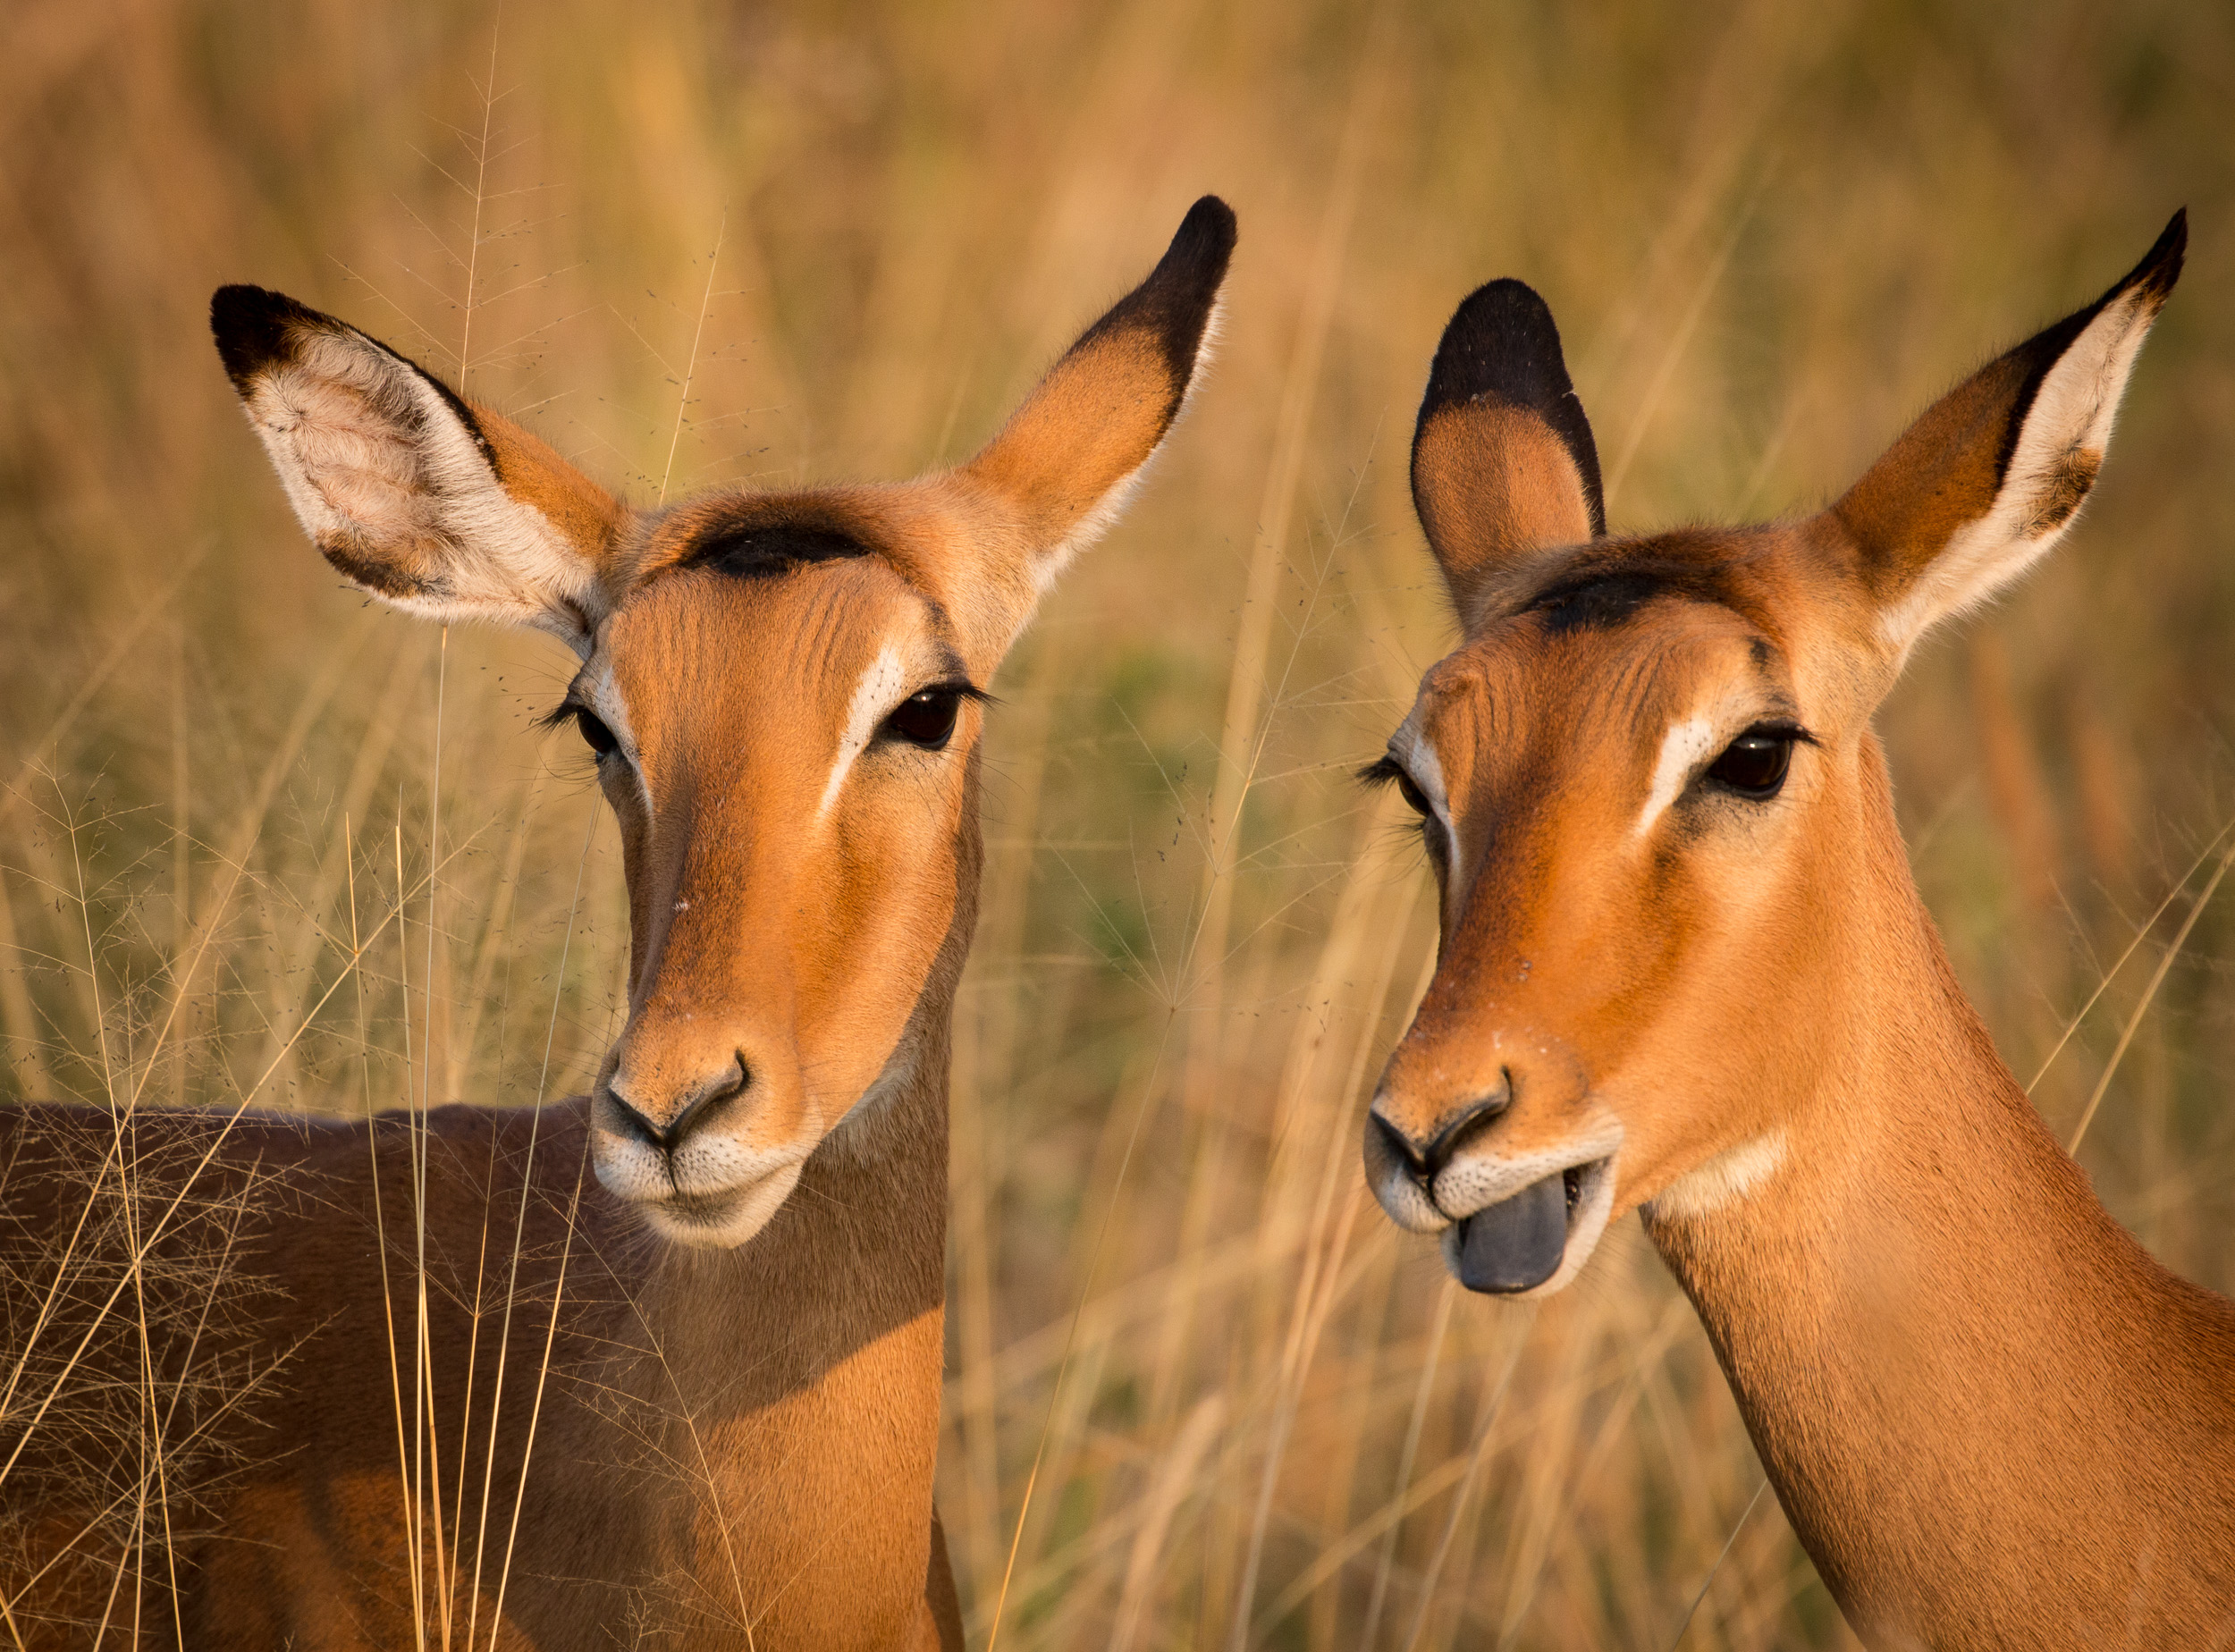 Two Impalas I